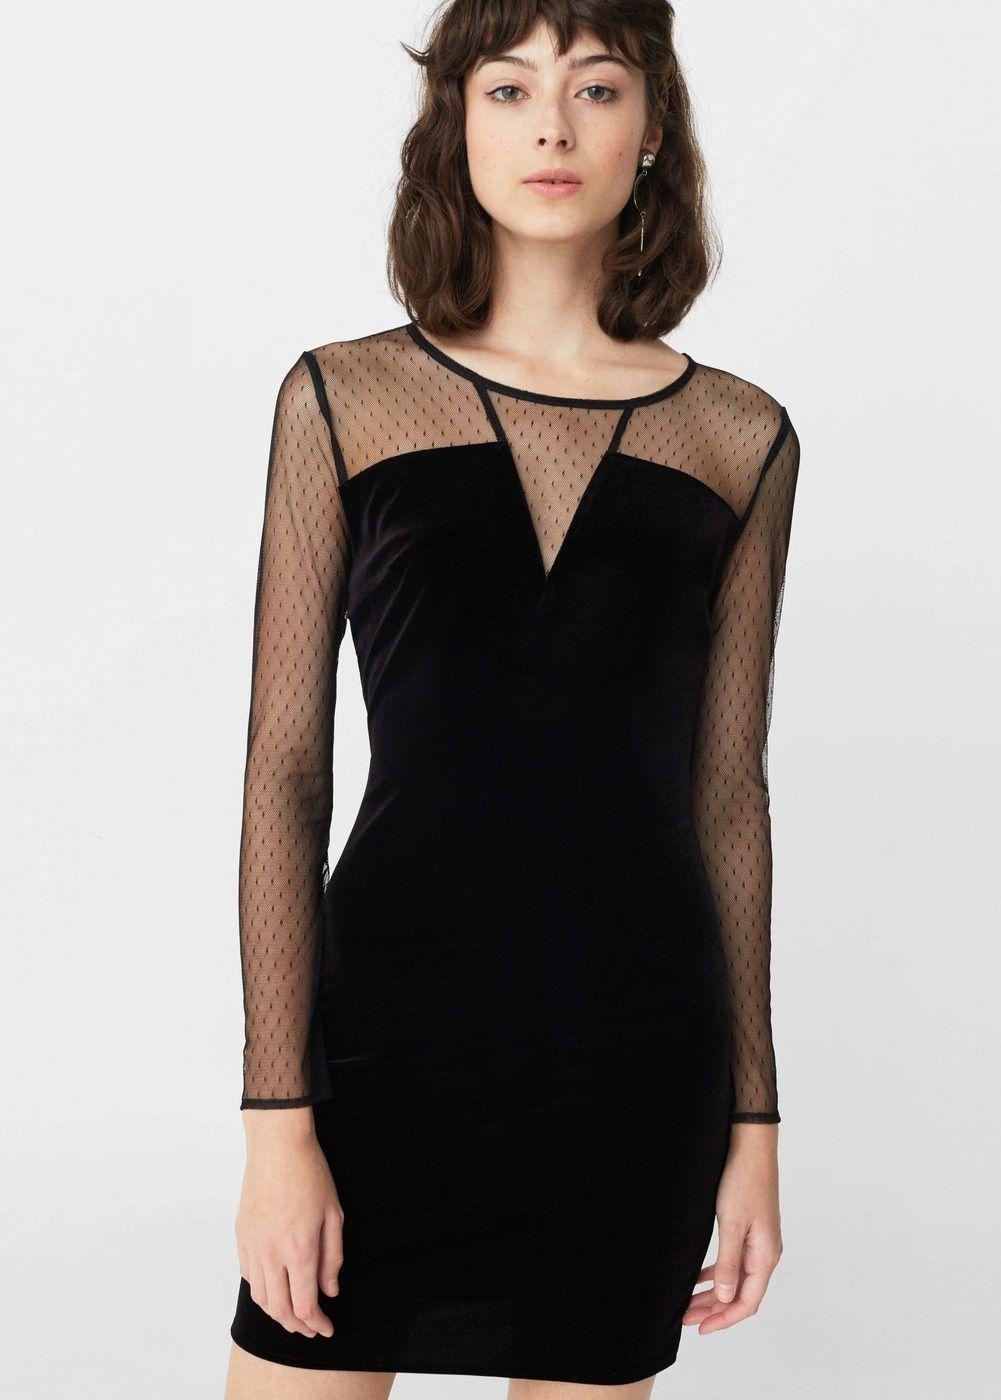 Velvet dress women woman clothes and fashion